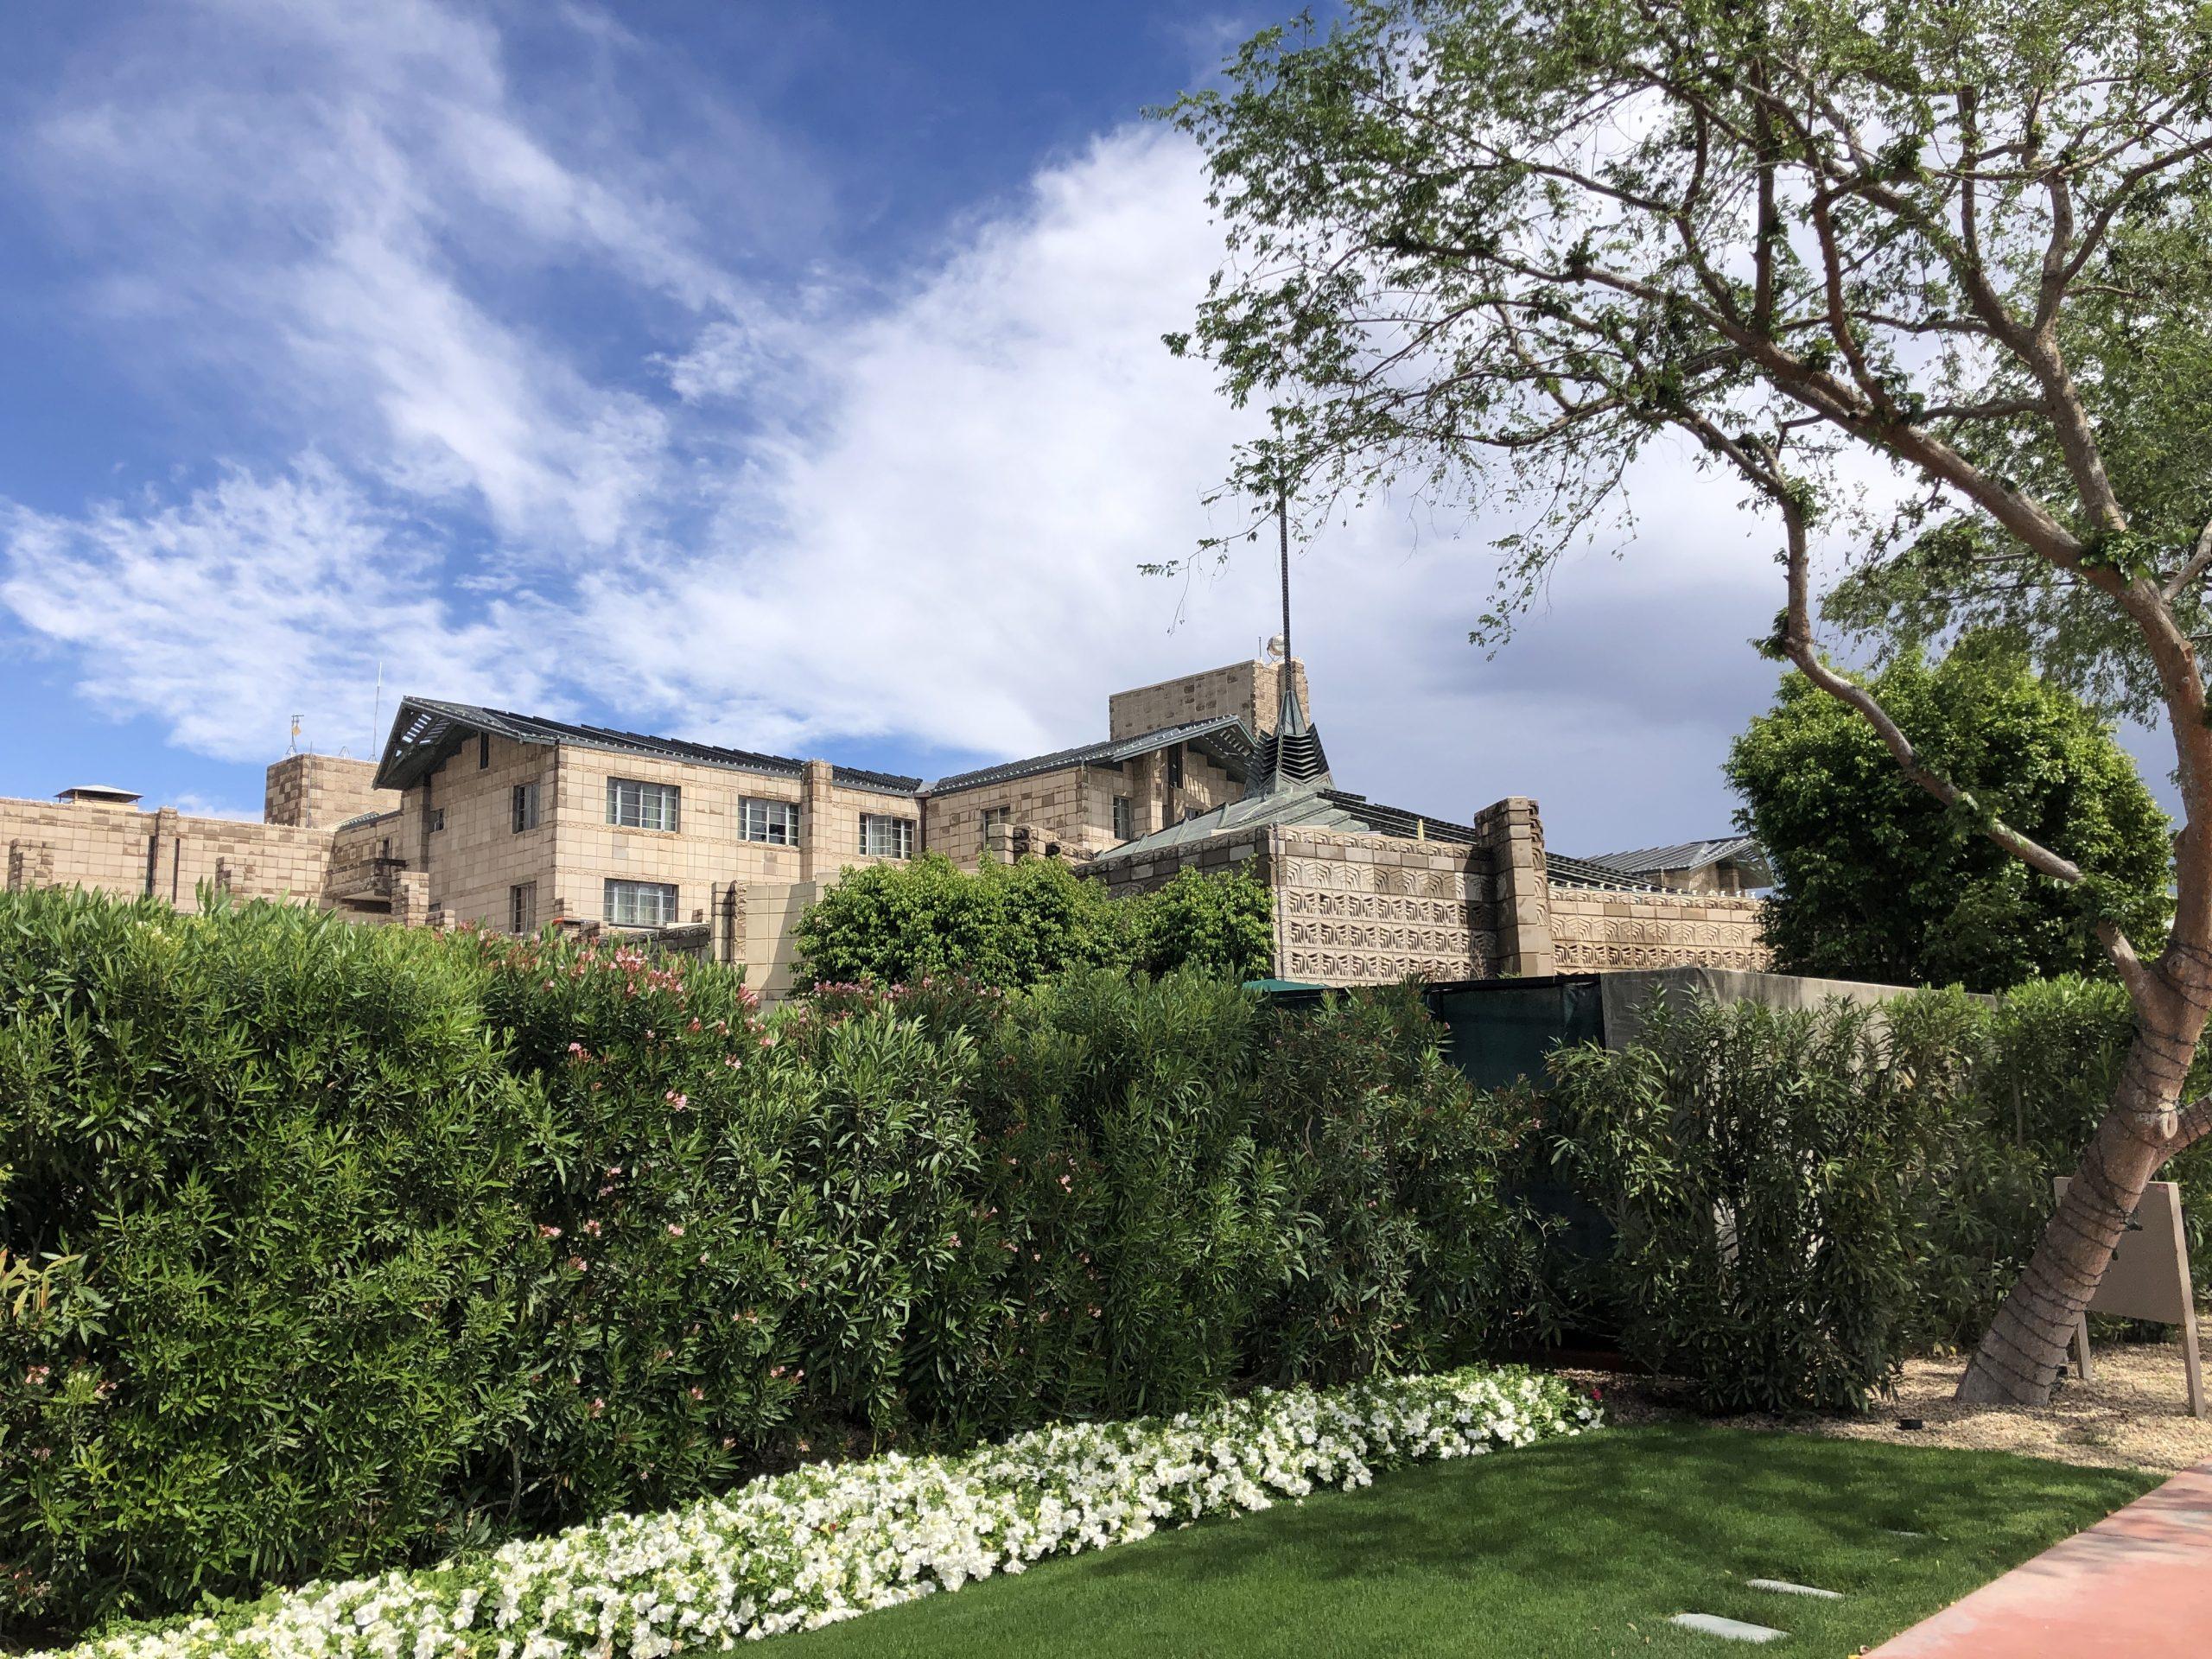 Arizona Biltmore Hotel, March 2020